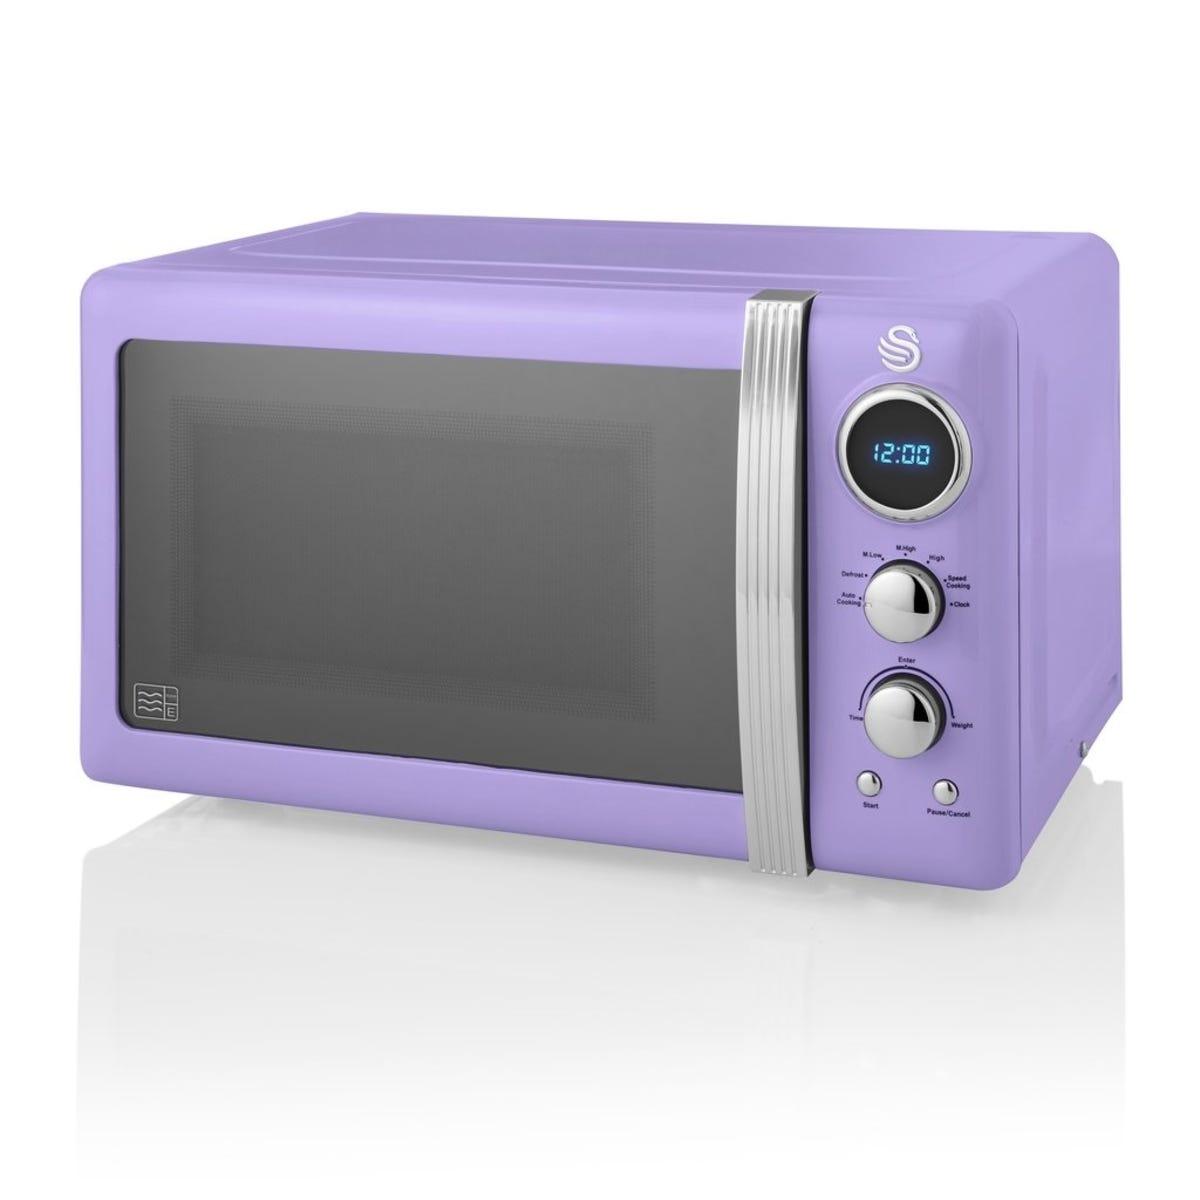 Swan SM22030PURN 800W 20L Retro Digital Microwave - Purple